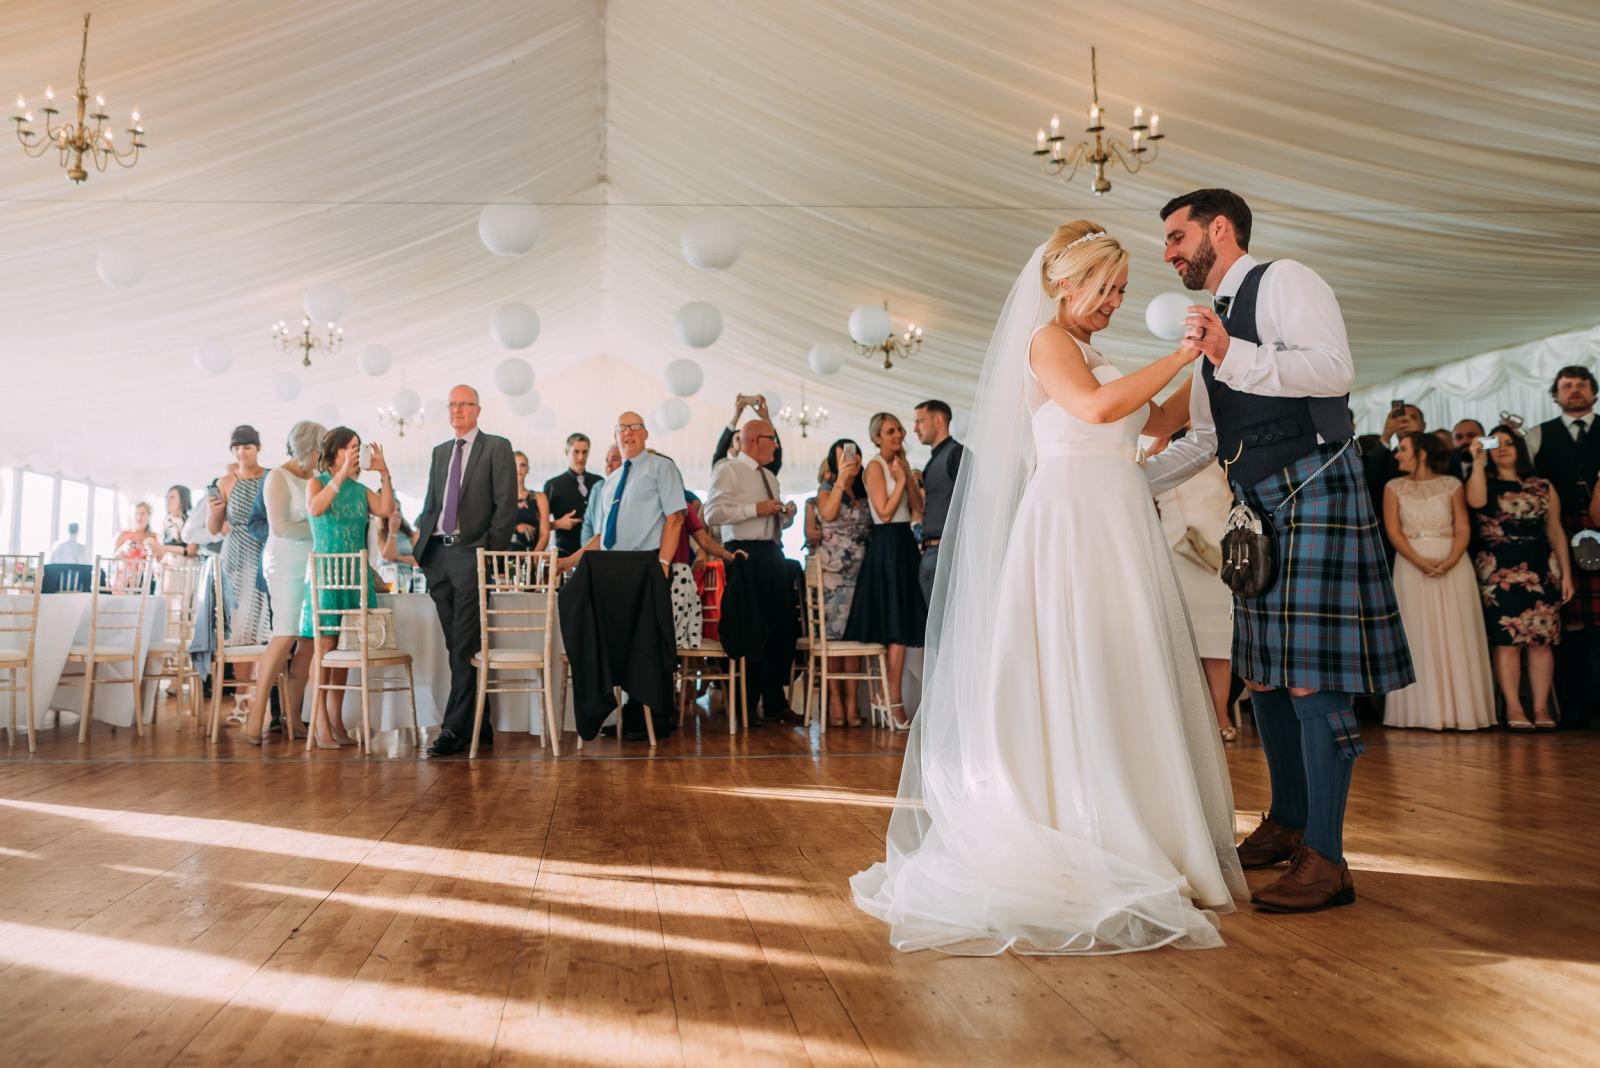 boturich-castle-wedding-593-of-656